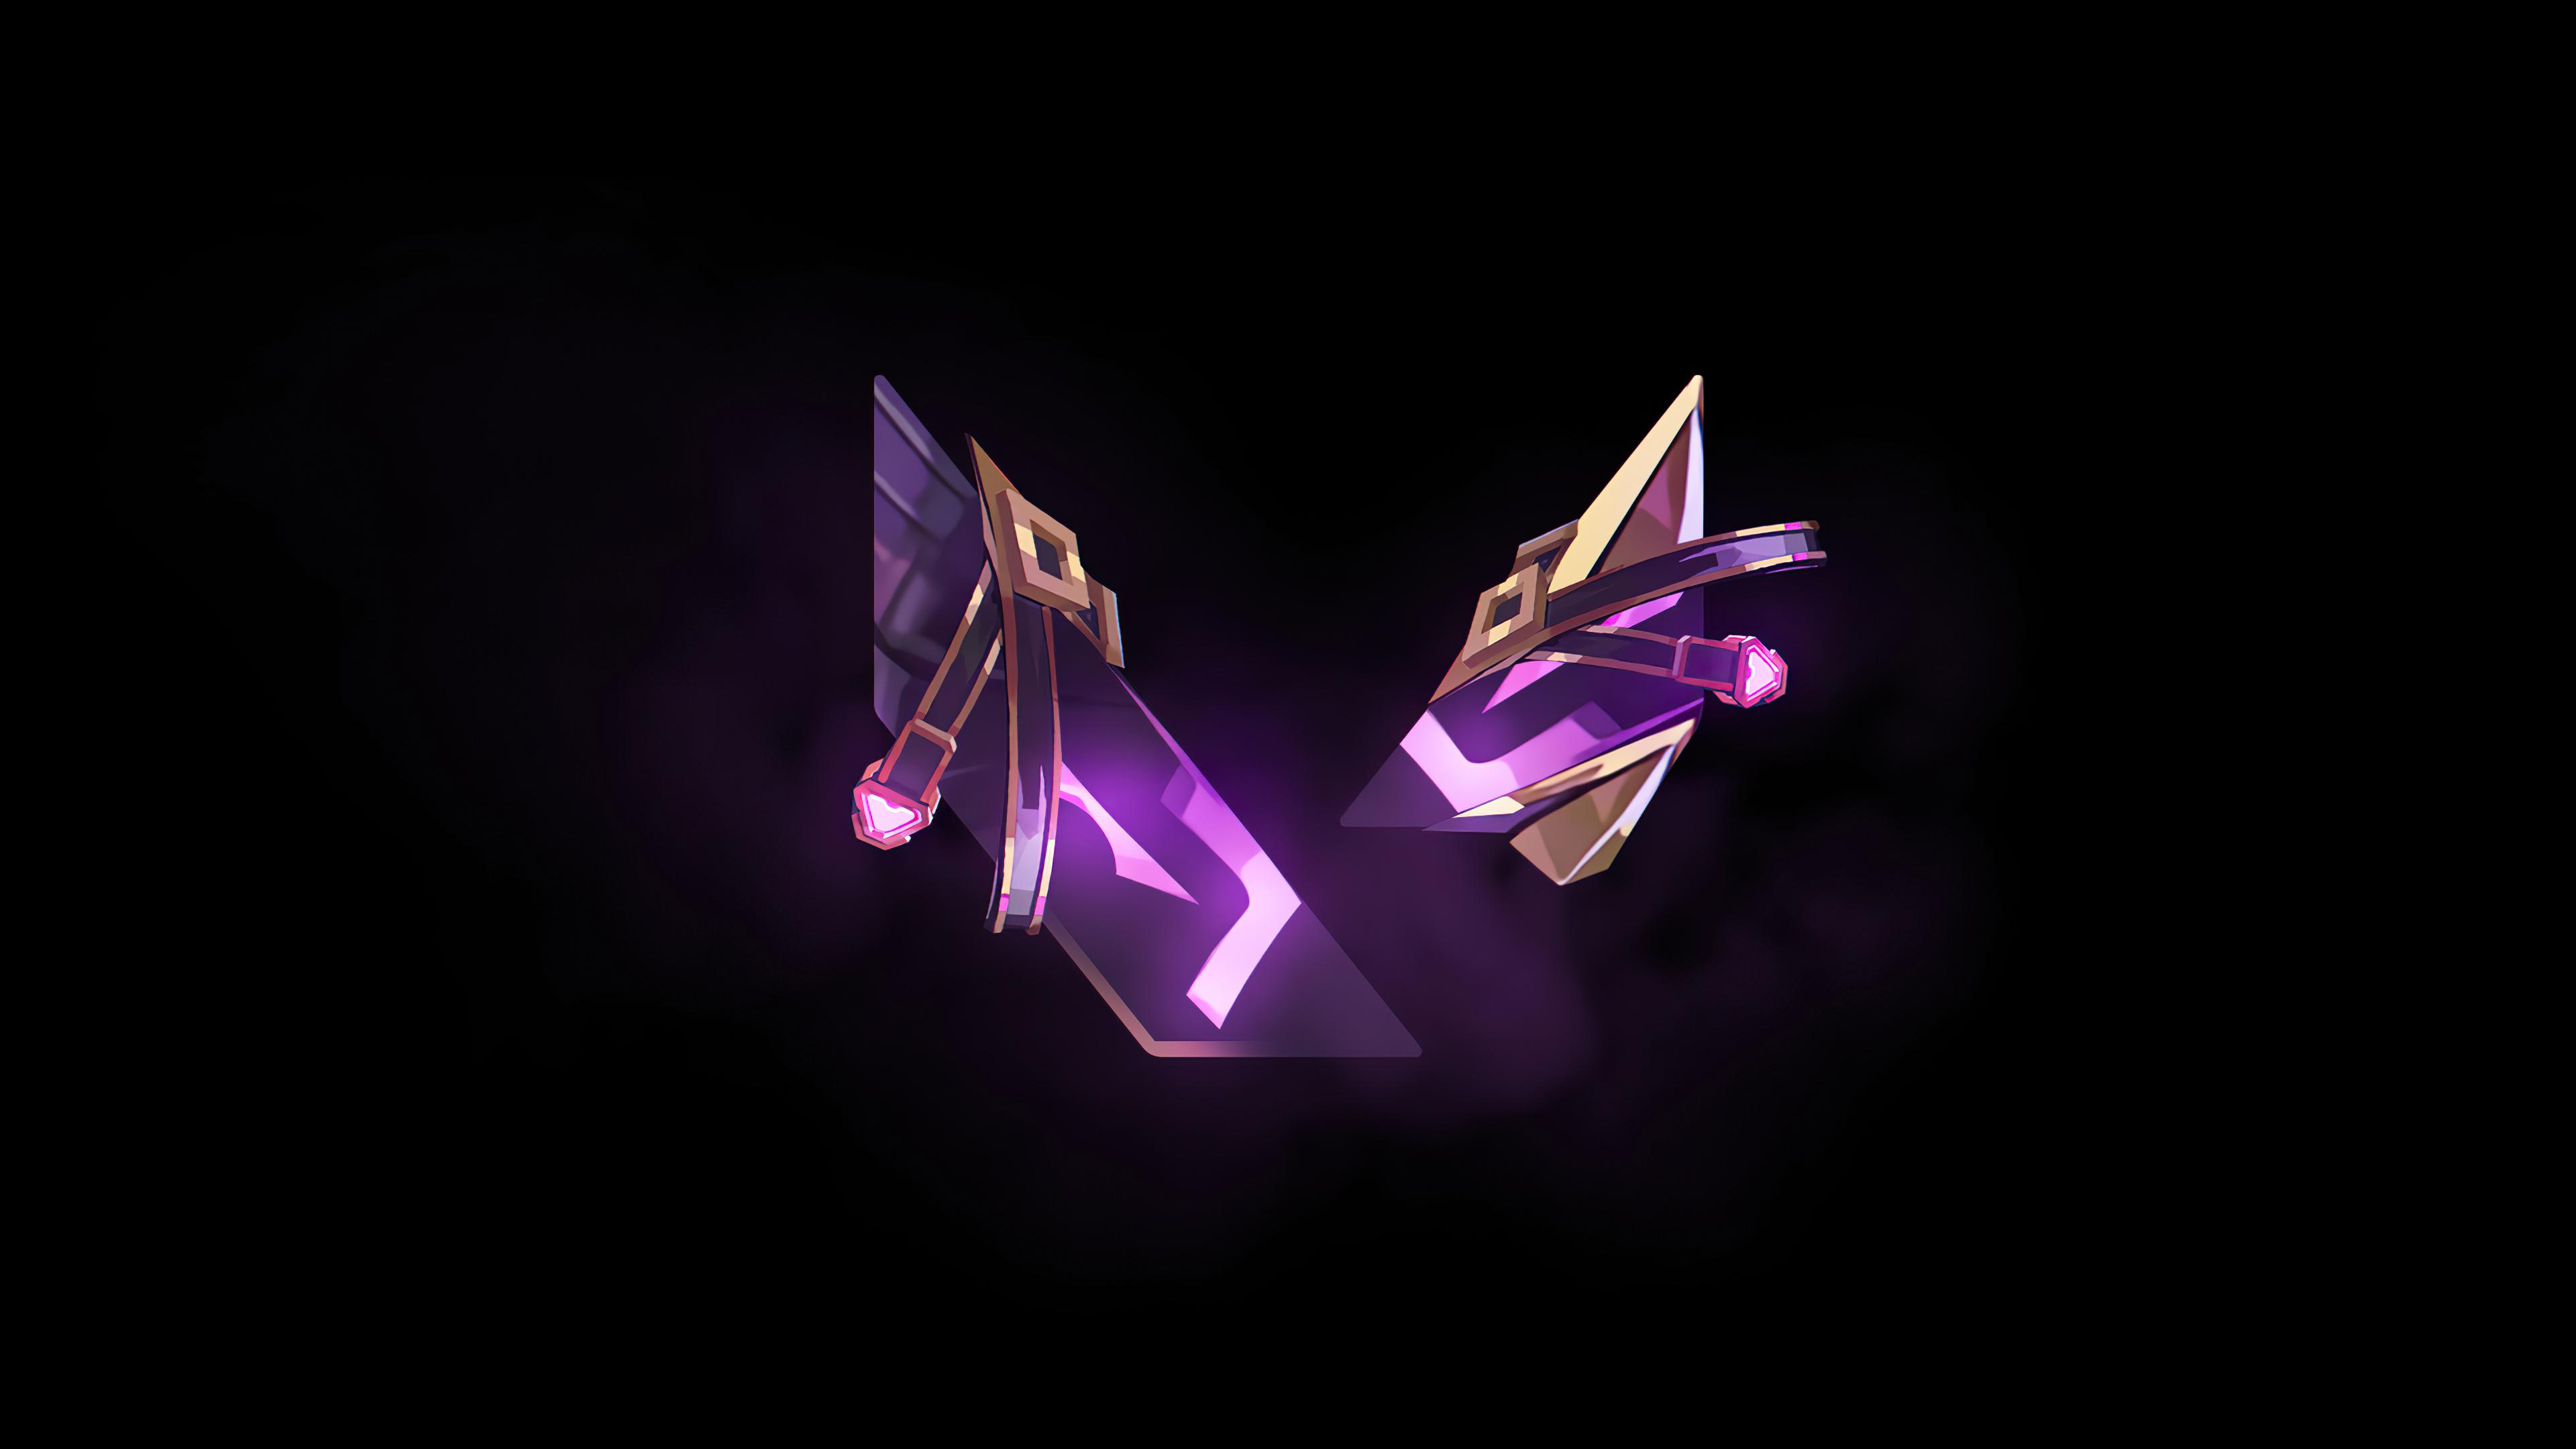 Viper Valorant Logo 4k, HD Games, 4k Wallpapers, Images ...